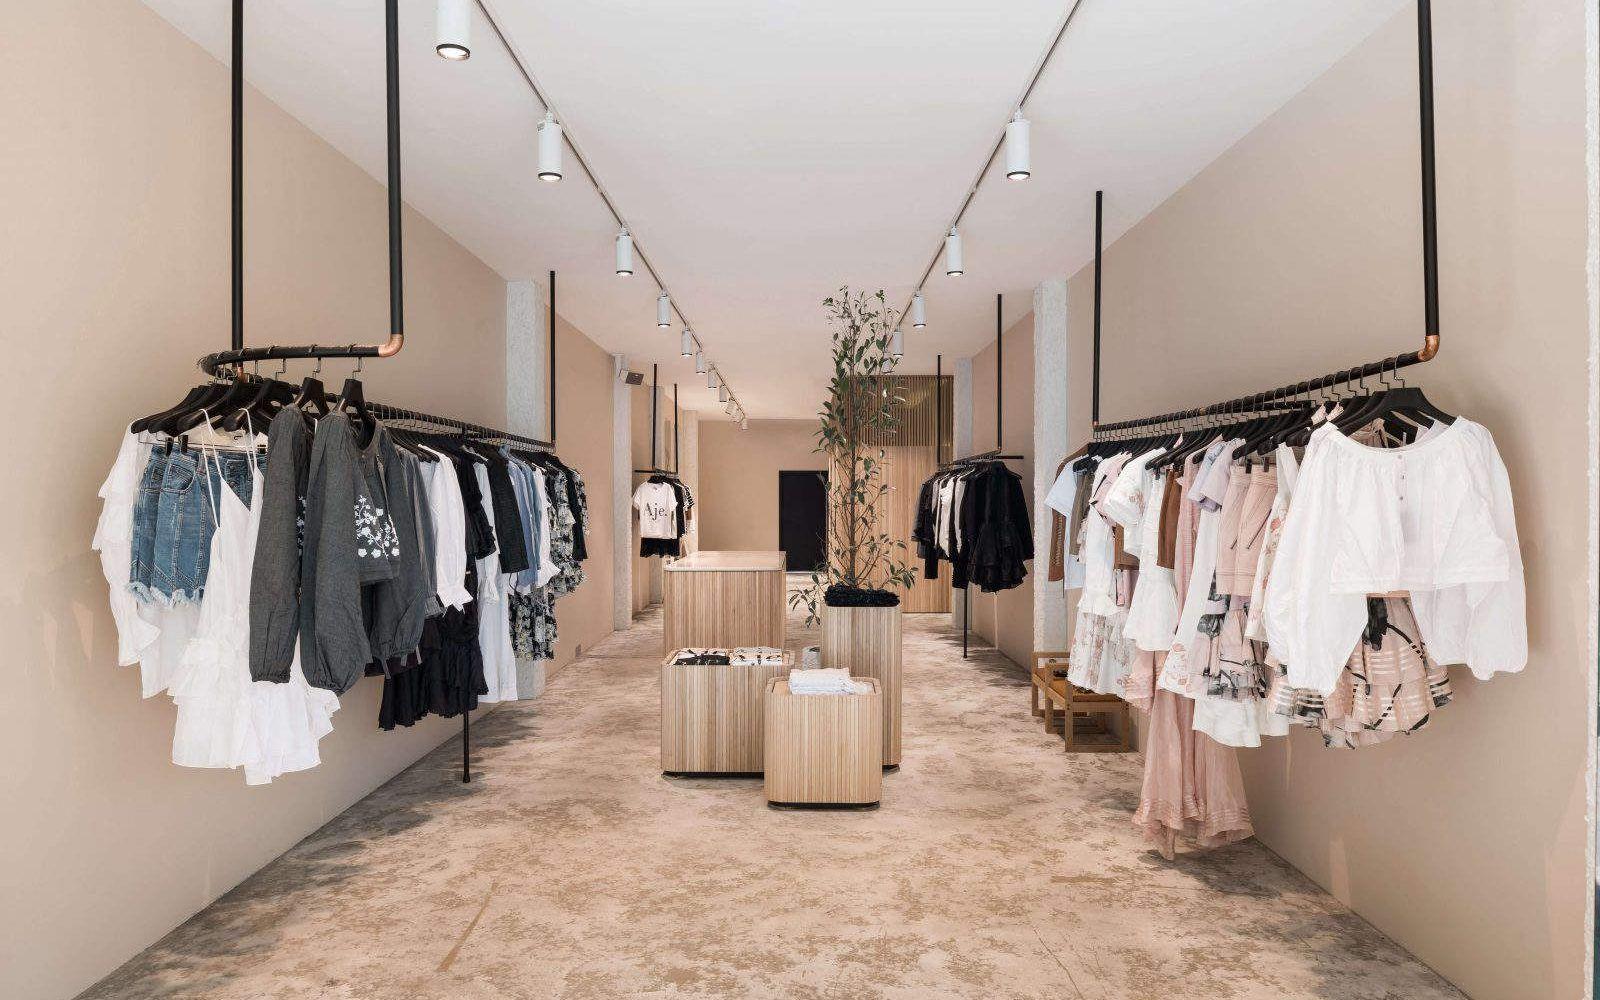 Https Boutiquestoredesign Com Design Fashion Showroom Ladies Dress Shop Interior Design In 2020 Clothing Store Interior Store Design Interior Fashion Showroom